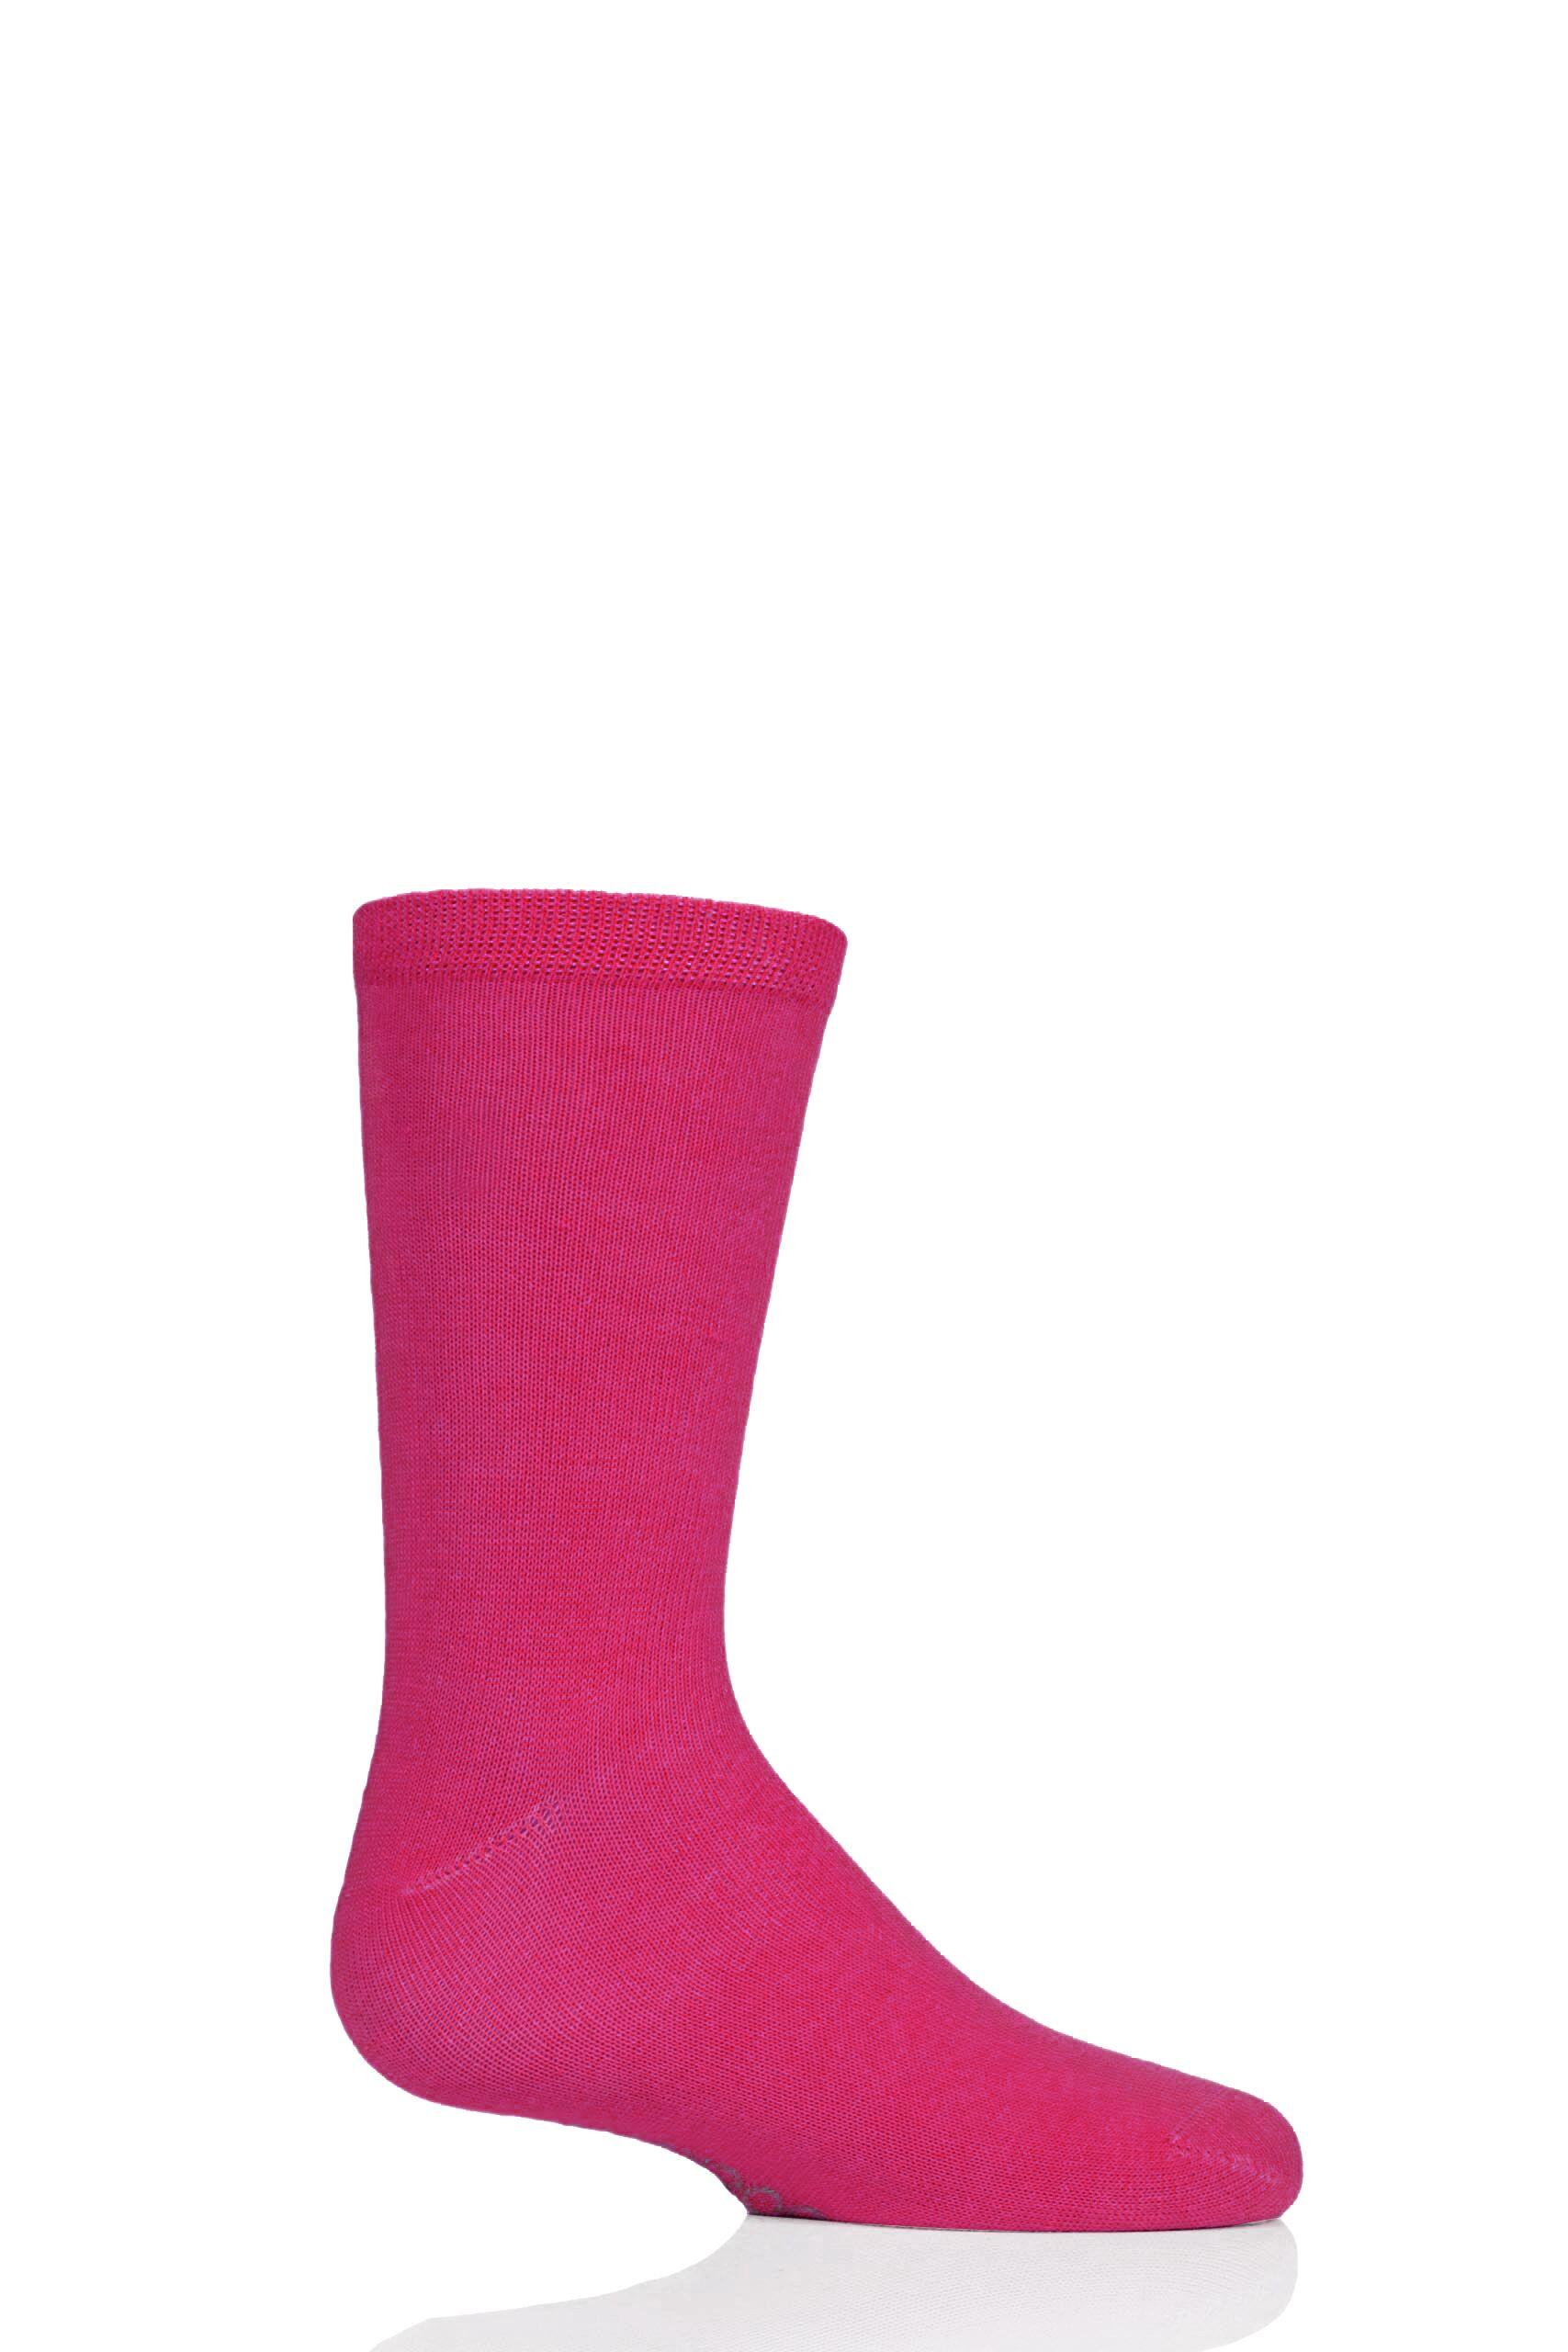 Image of 1 Pair Dark Pink Plain Bamboo Socks with Comfort Cuff and Smooth Toe Seams Kids Unisex 4-5.5 Kids (13-14 Years) - SOCKSHOP